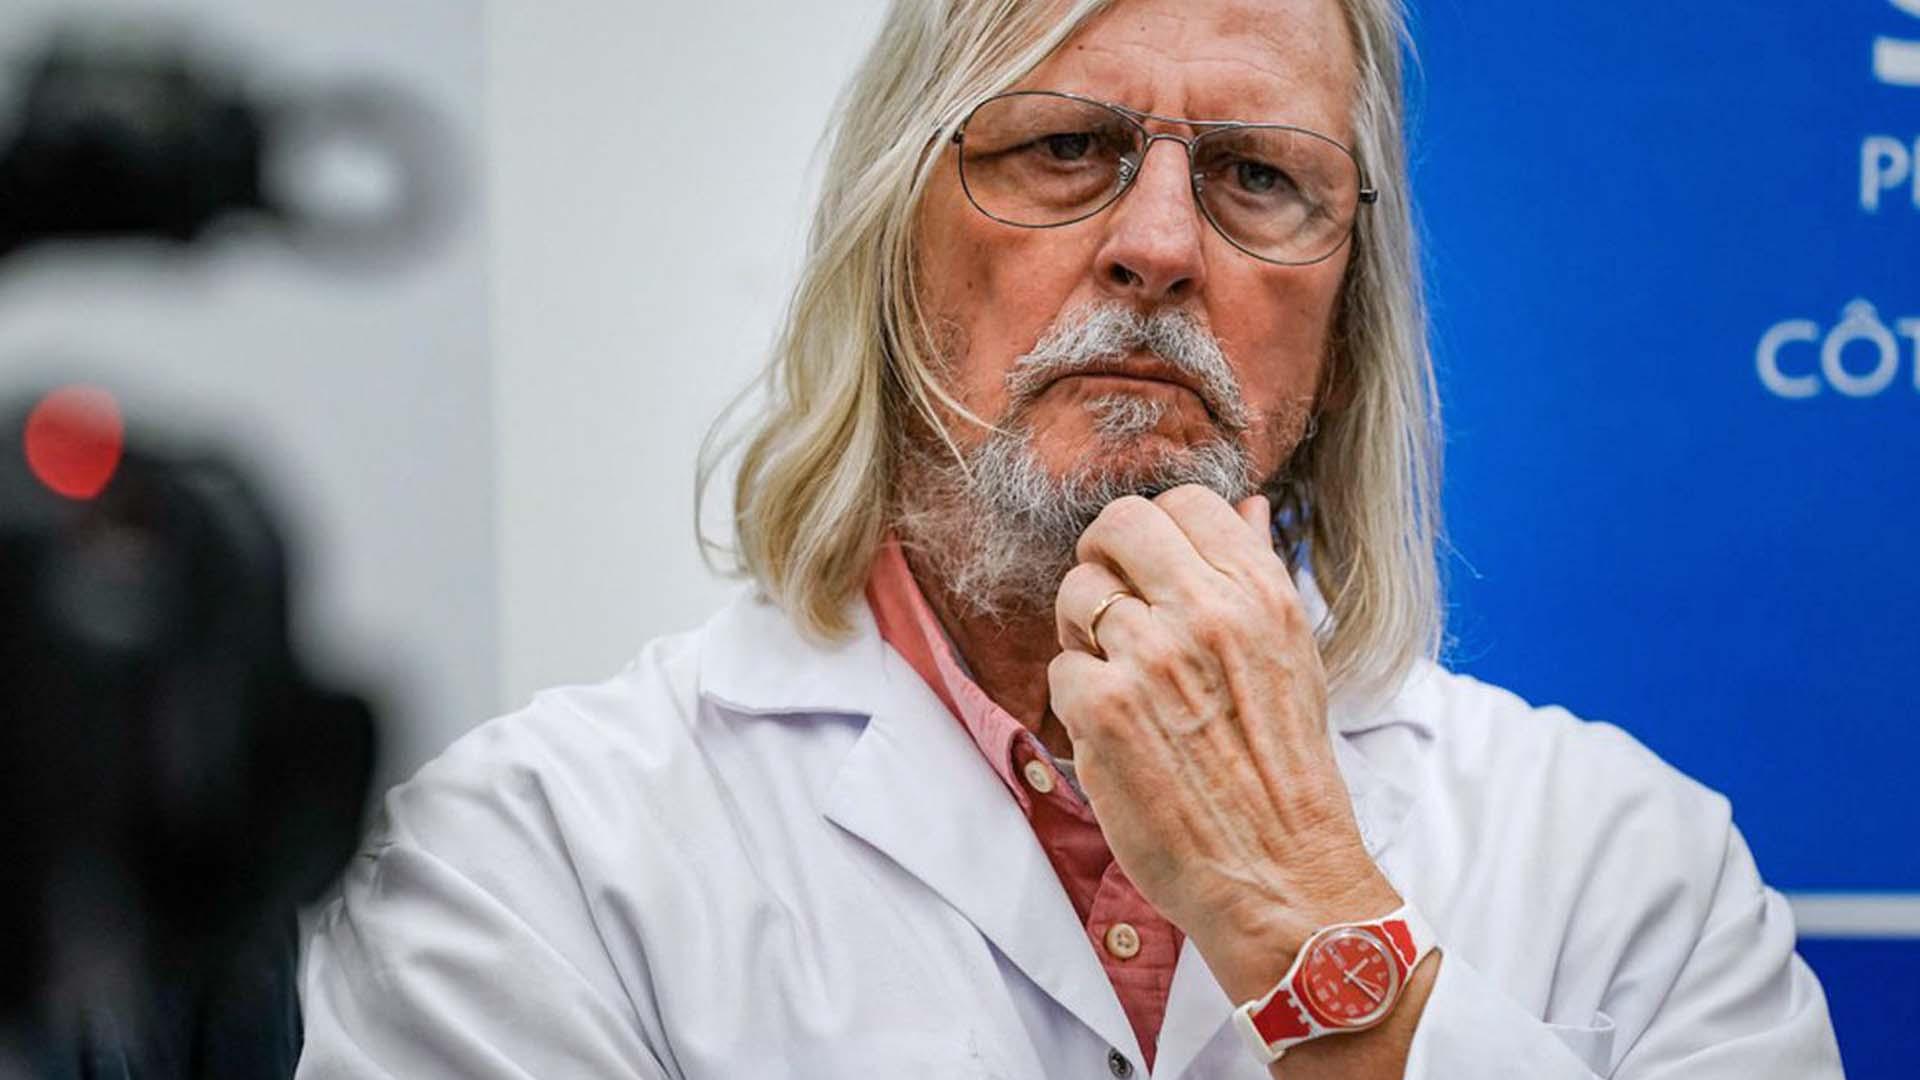 Il dott. Didier Raoult dell